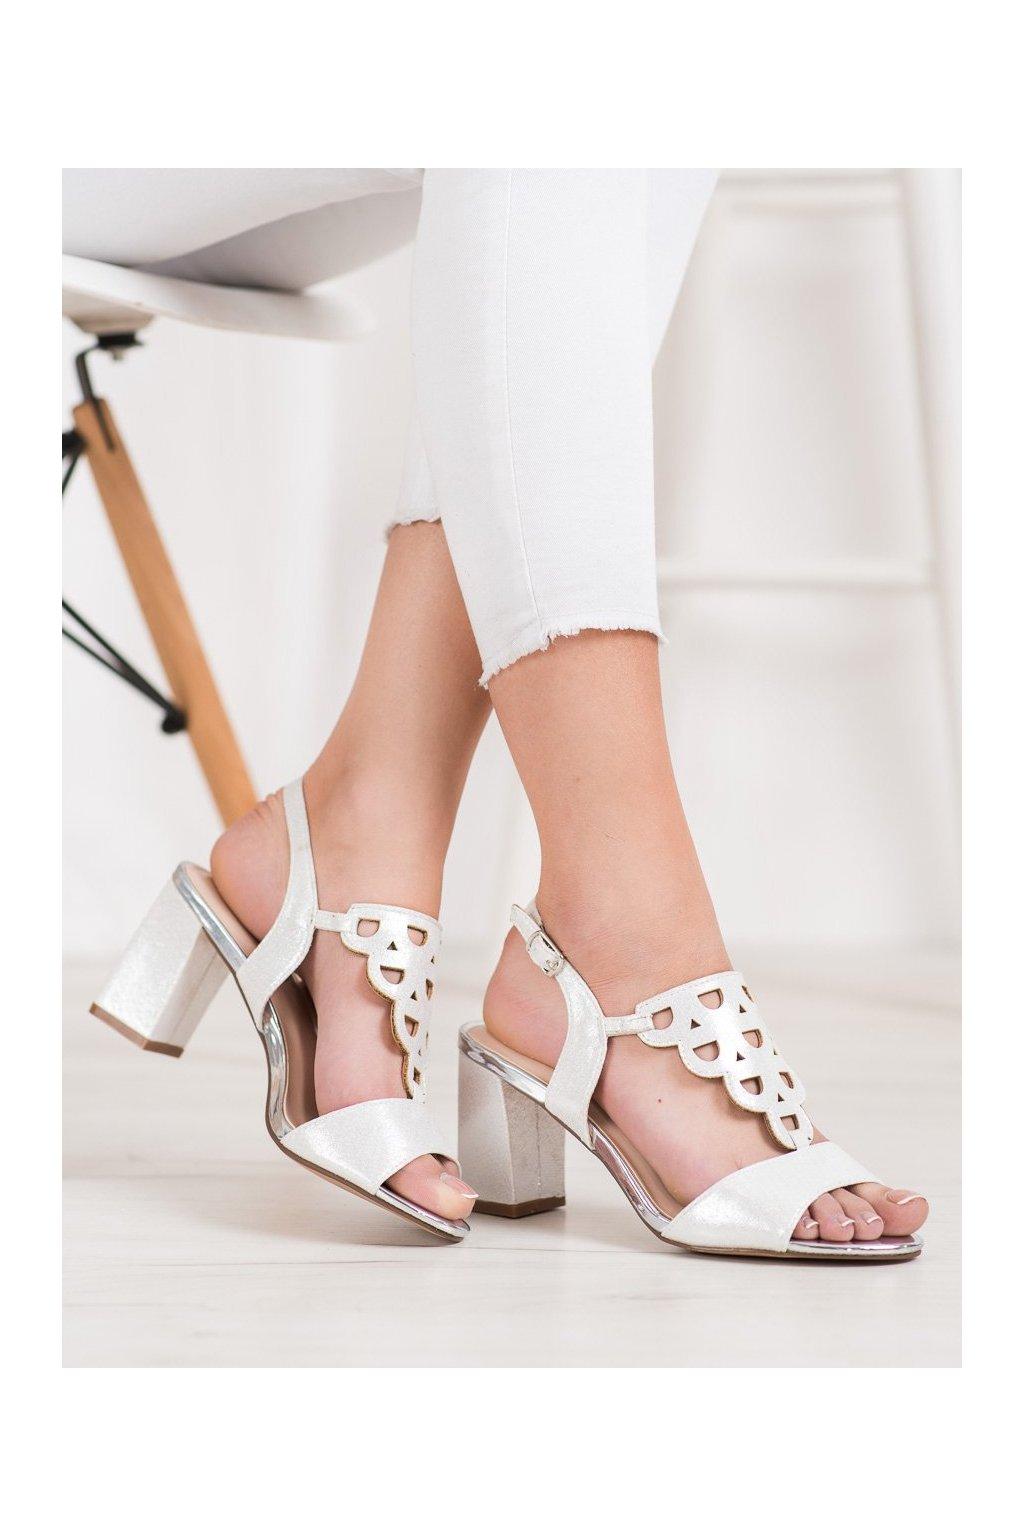 Sivé sandále Vinceza kod YQE20-17080S